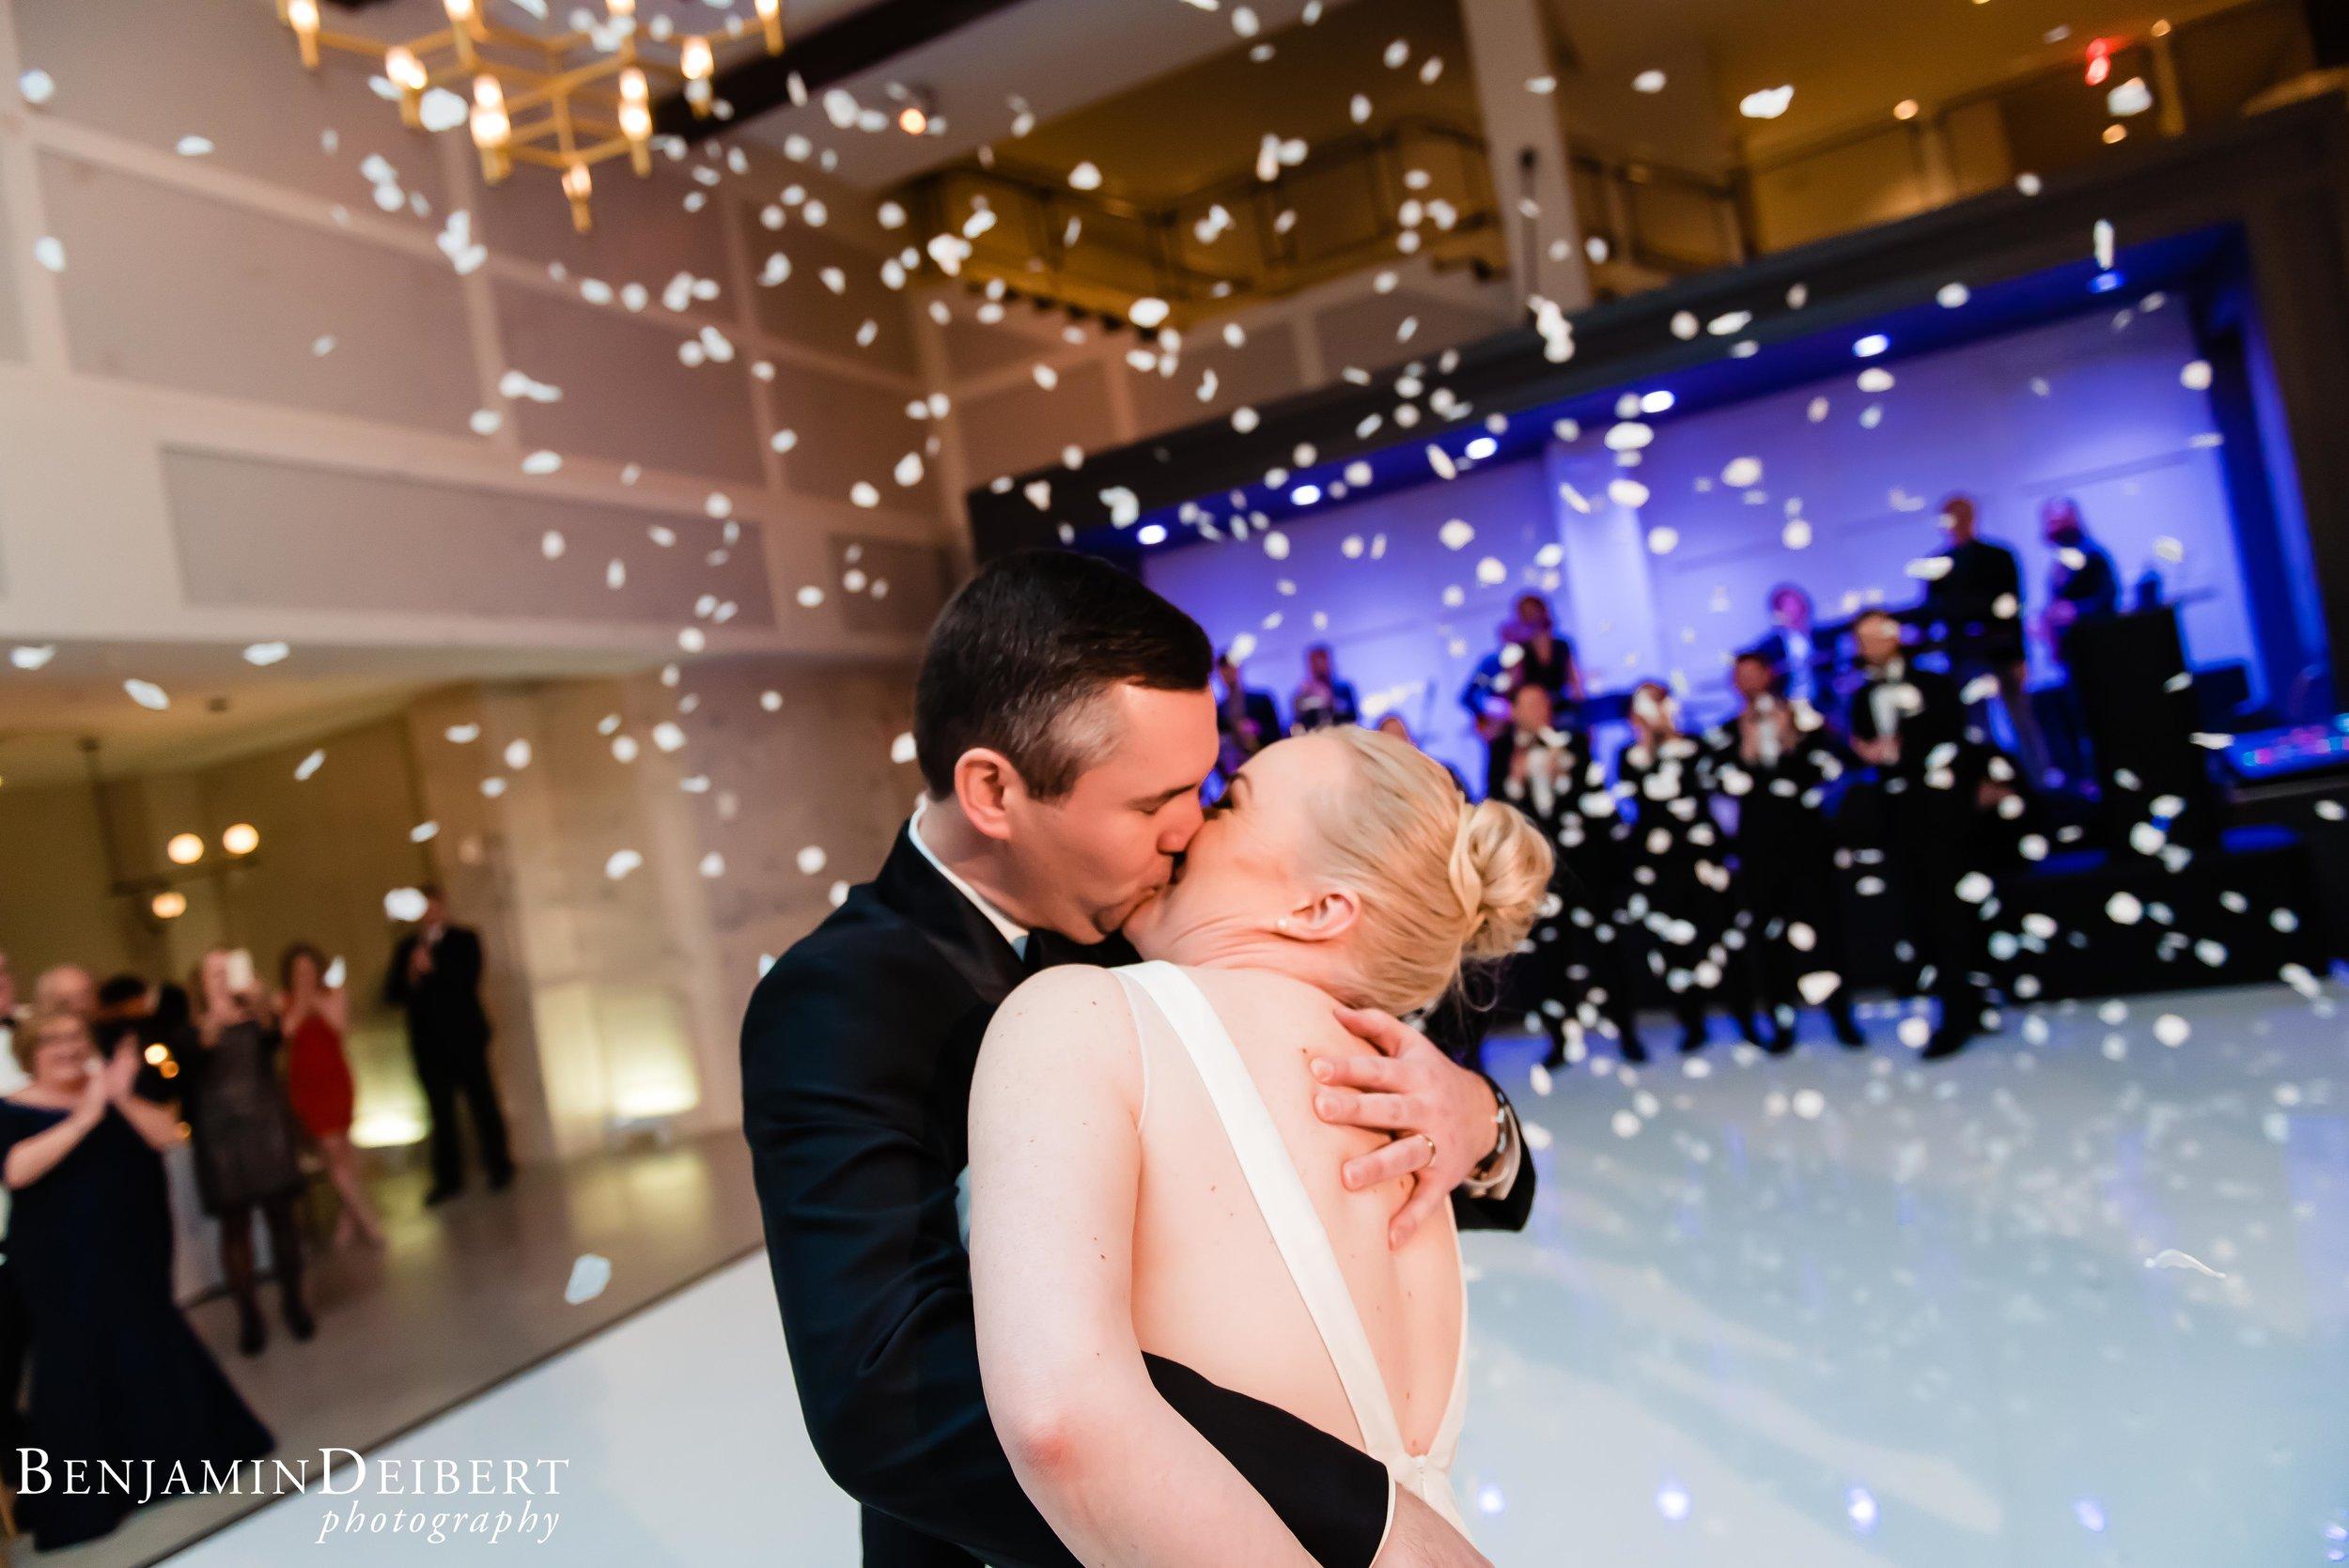 PatriceandAdam_TheLucy__Cescaphe_Wedding-50.jpg